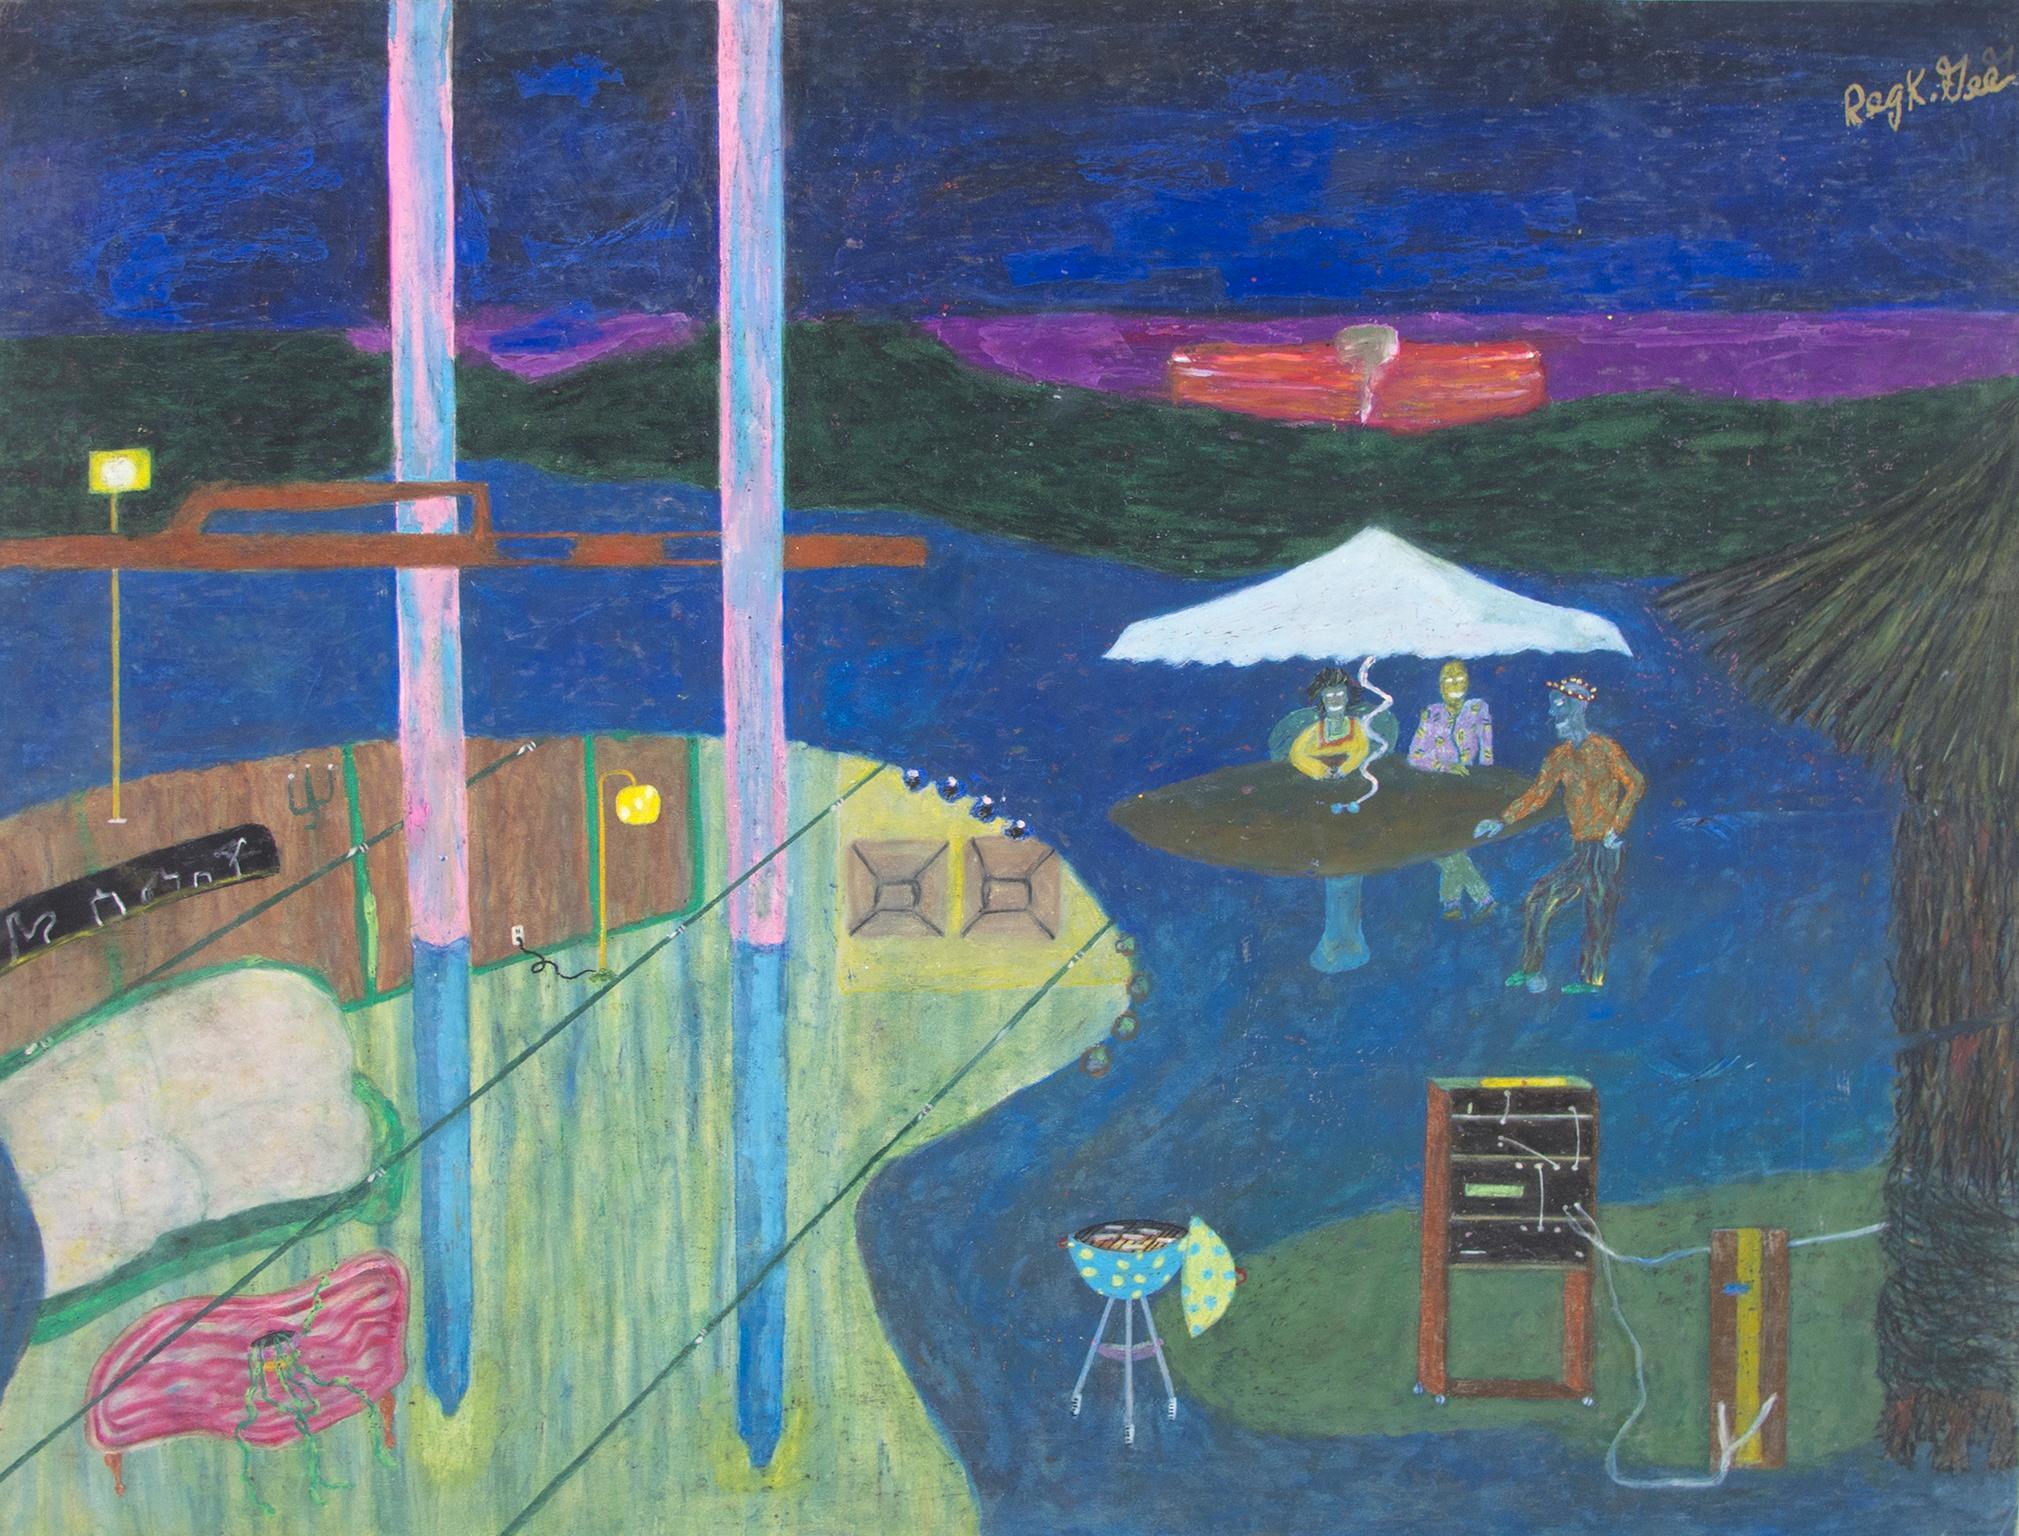 Reginald K. Gee Landscape Drawings and Watercolors